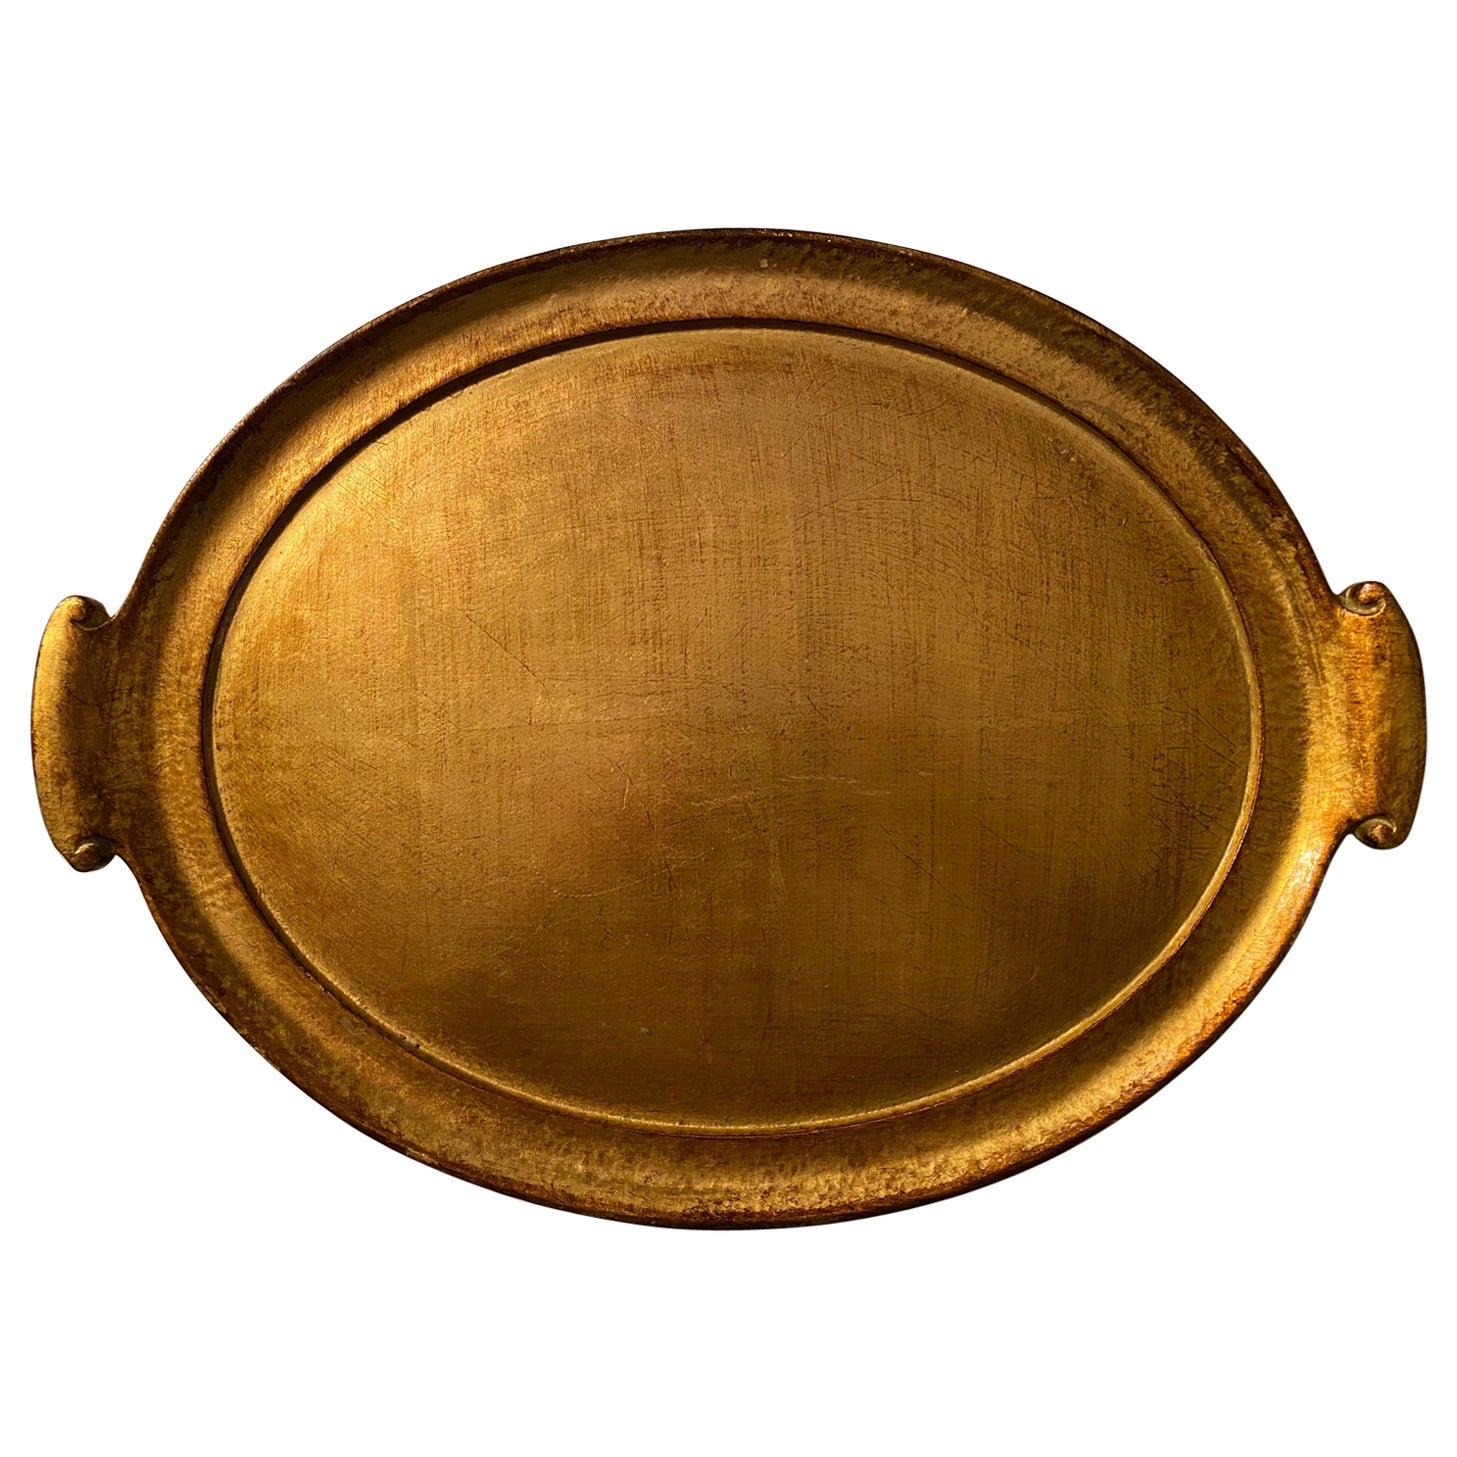 Vietri Florentine Wooden Accesories Handled Gold Leaf Medium Oval Tray